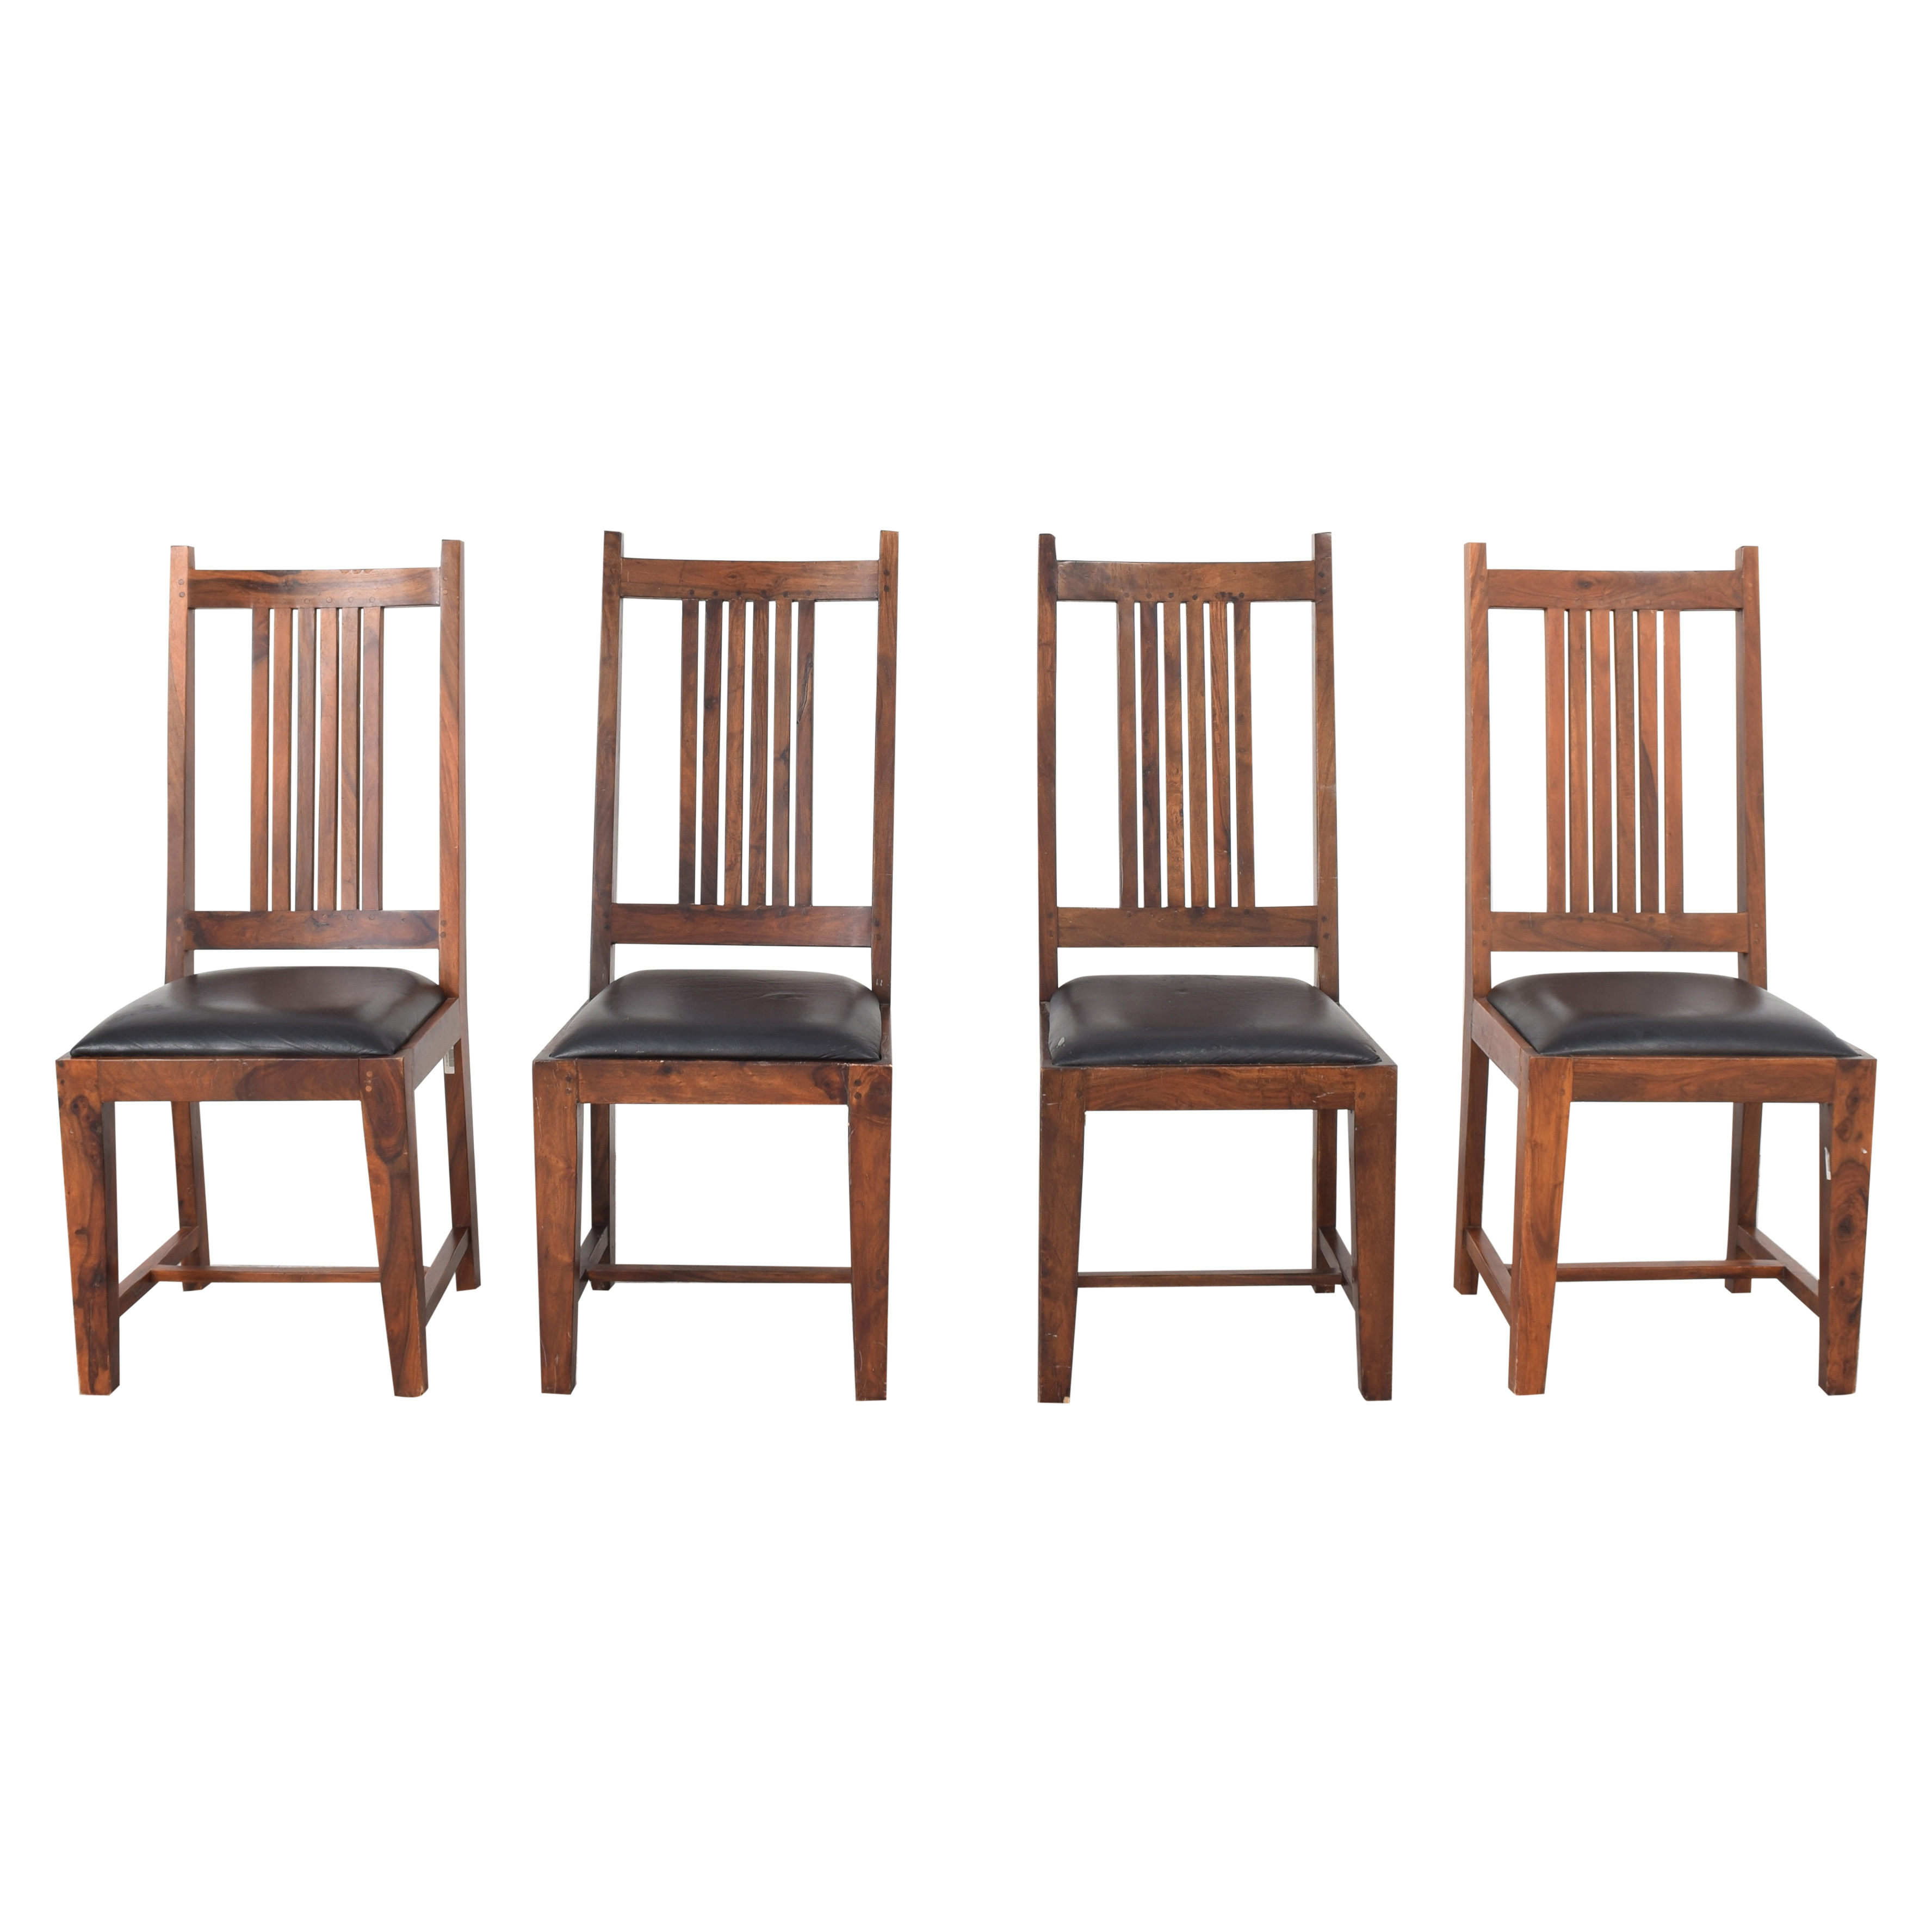 shop ABC Carpet & Home Dining Chairs ABC Carpet & Home Chairs